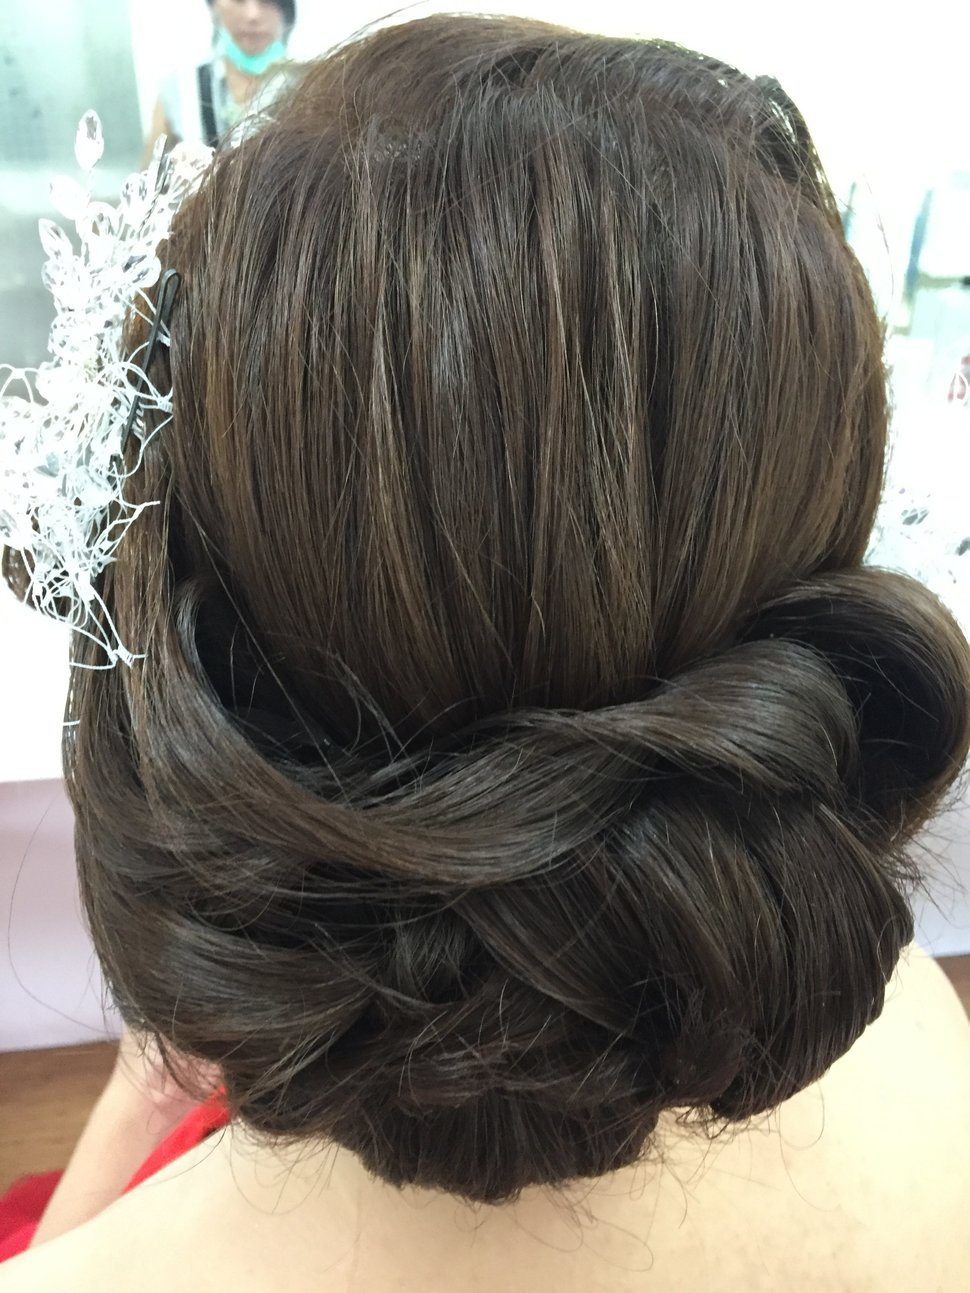 IMG_2095 - Jojo chen Makeup新娘秘書《結婚吧》